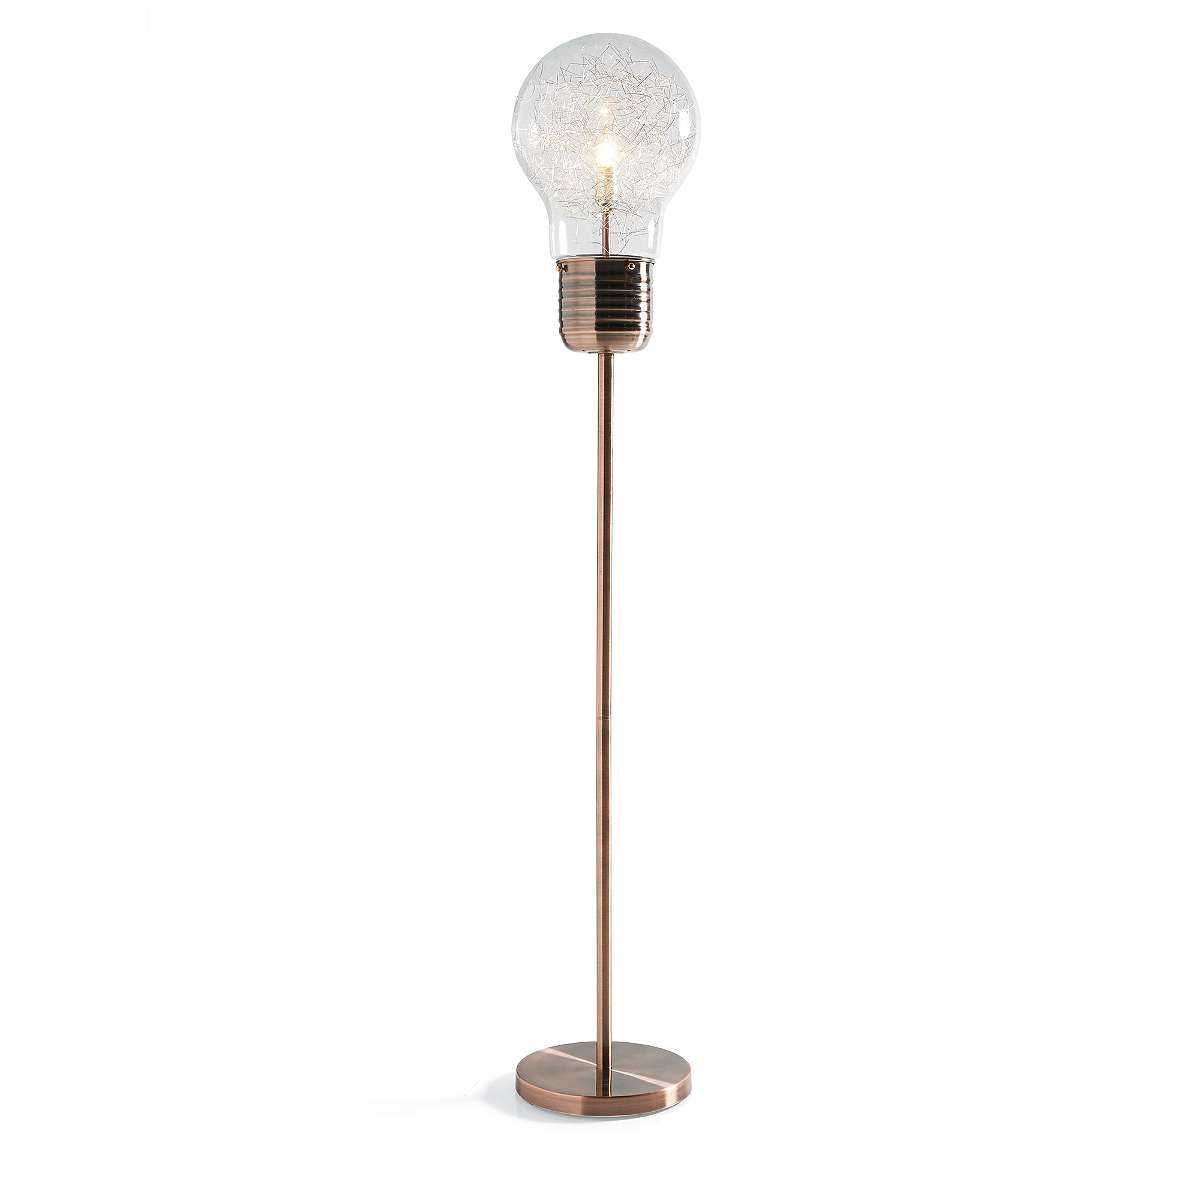 Light bulb floor lamp makes your room look awesome warisan lighting light bulb floor lamp makes your room look awesome mozeypictures Image collections